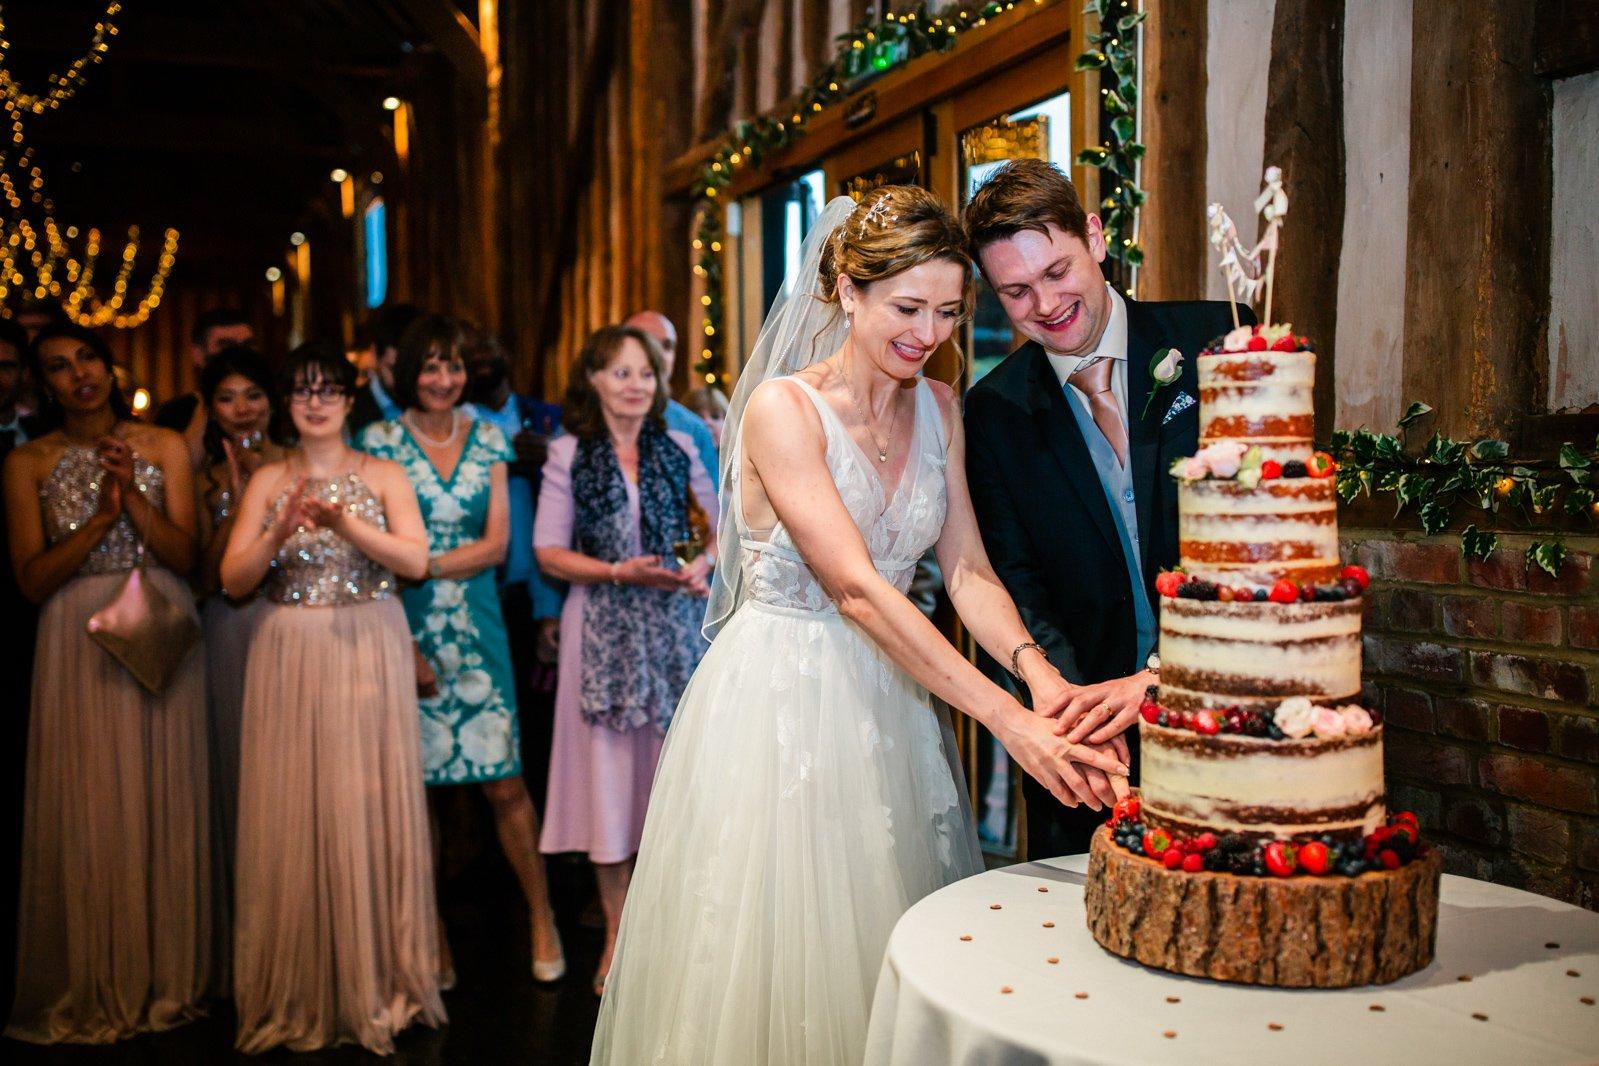 Beautiful Lillibrooke Manor Wedding - Ksenia & Iain 173